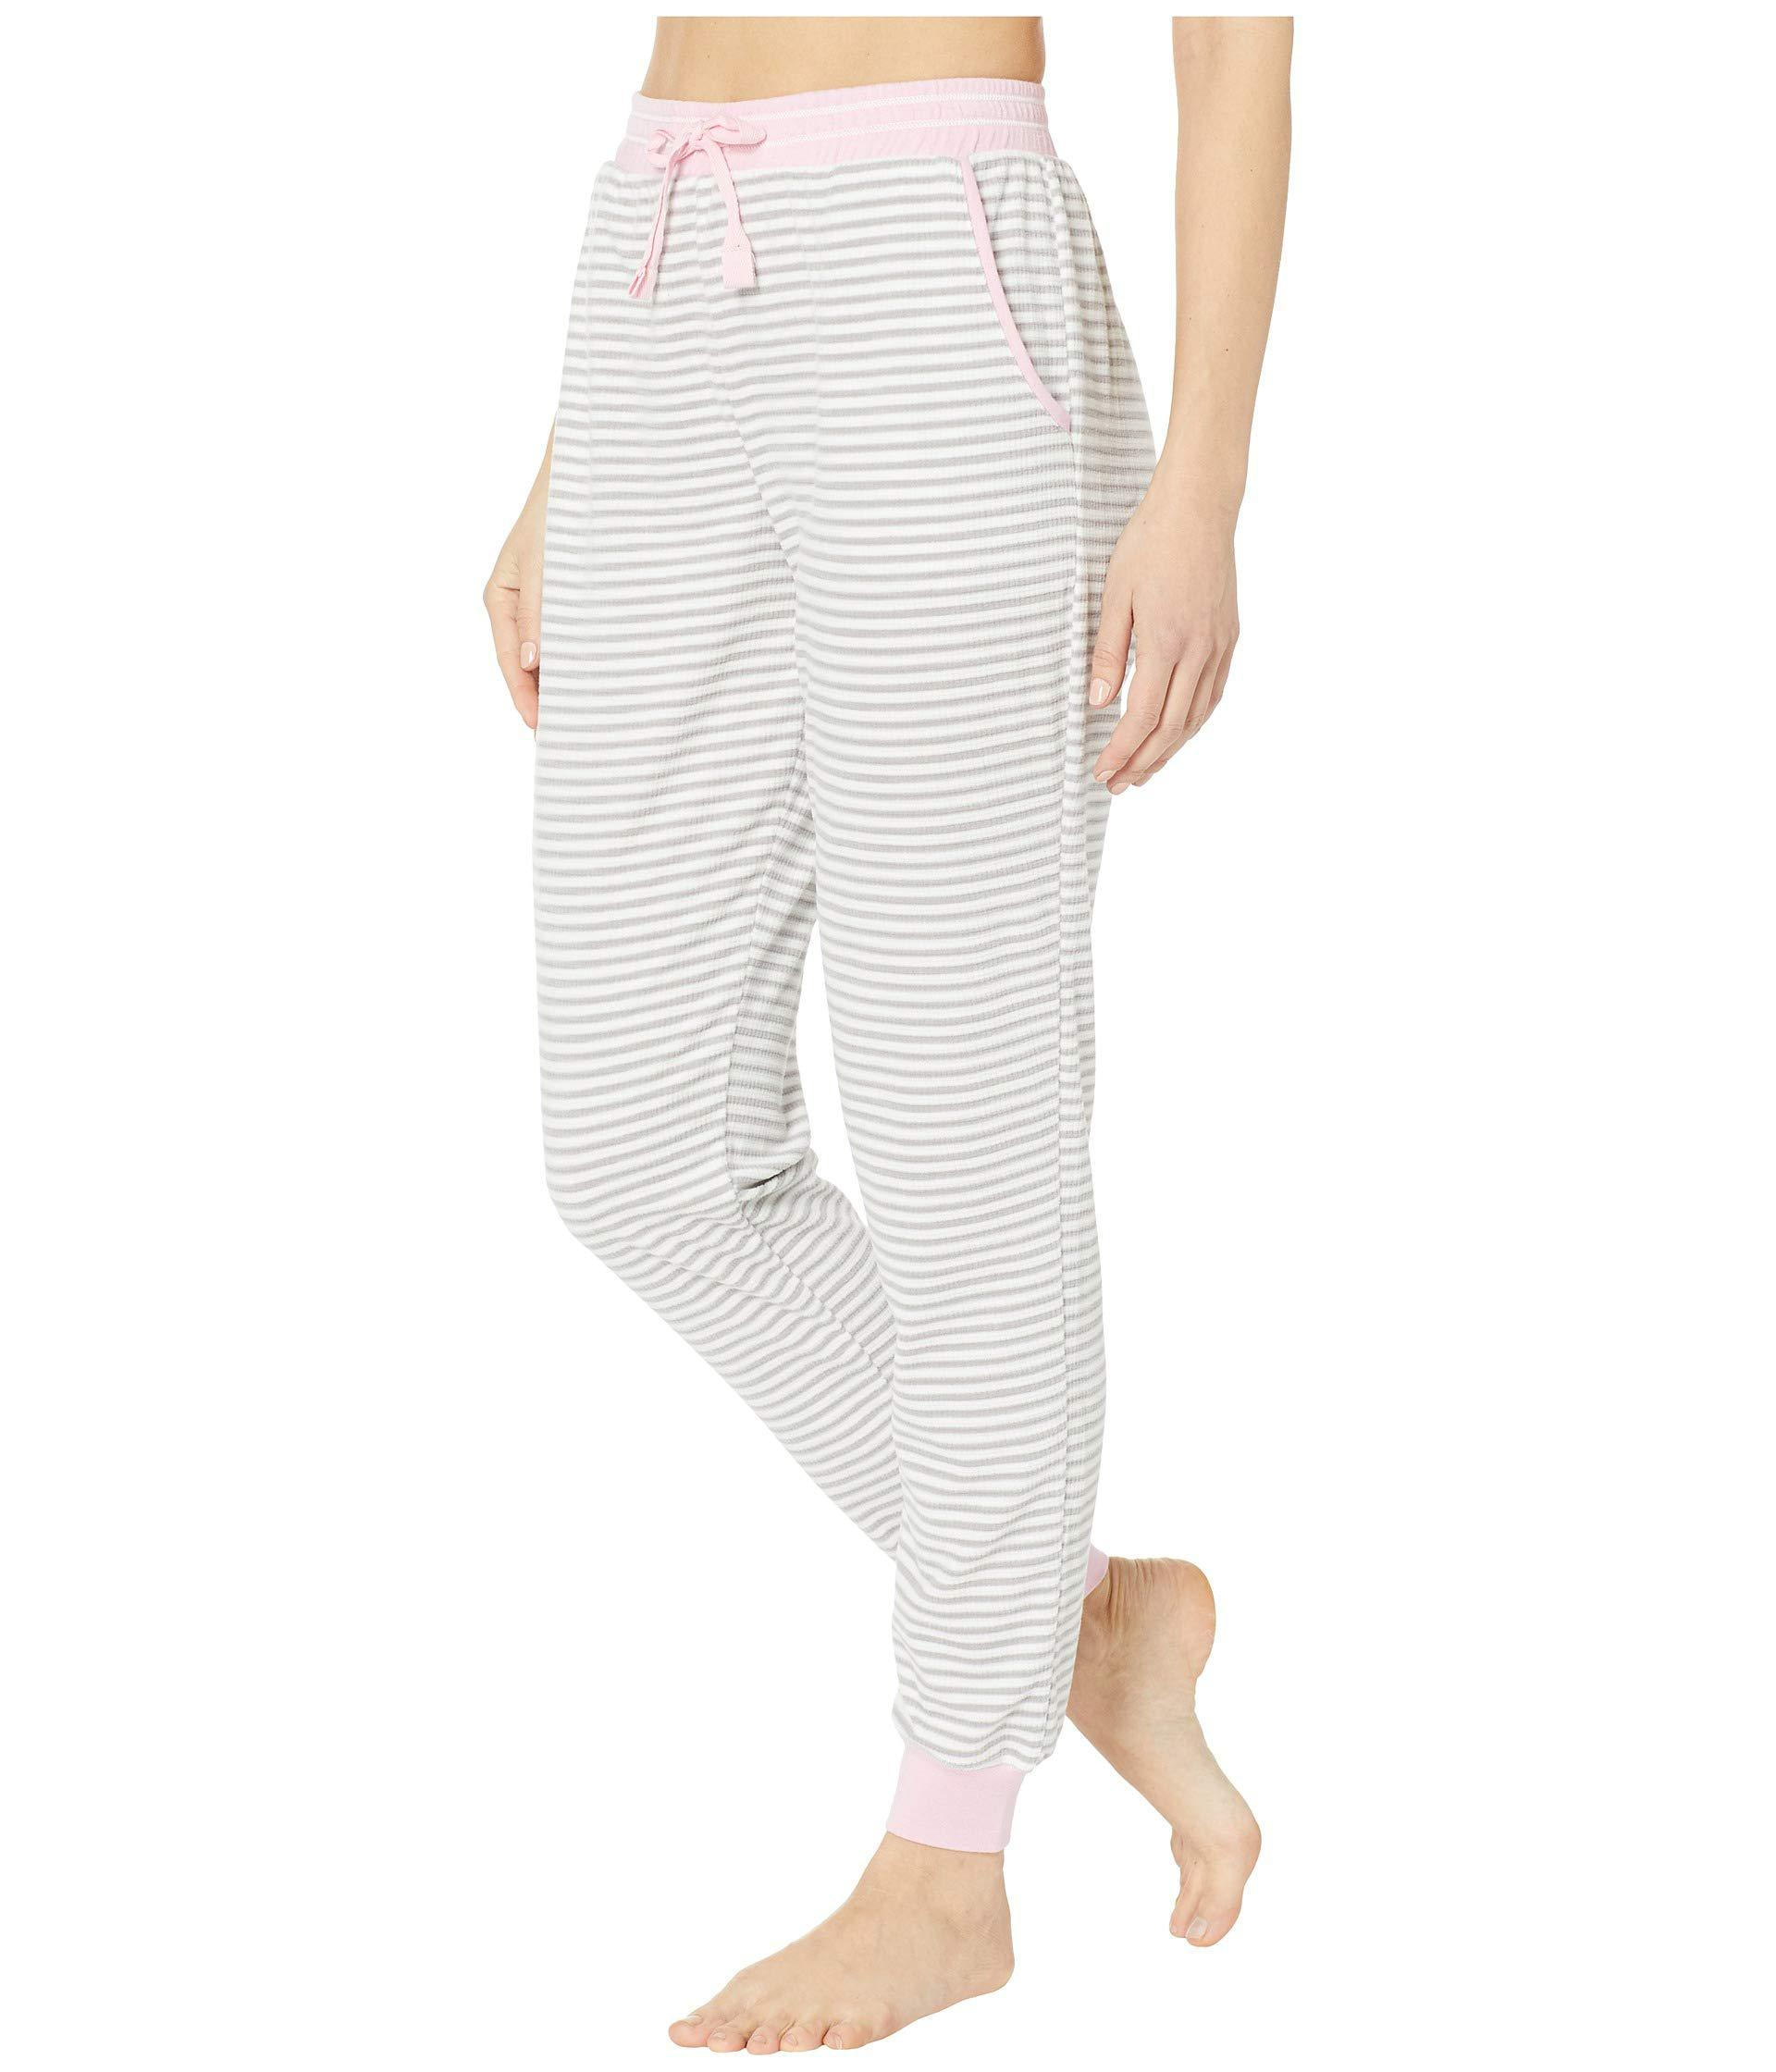 2fad40e009 Lyst - Jockey Cozy Fleece Jogger Pajama Pants (mini Grey Stripe) Women s  Pajama in Gray